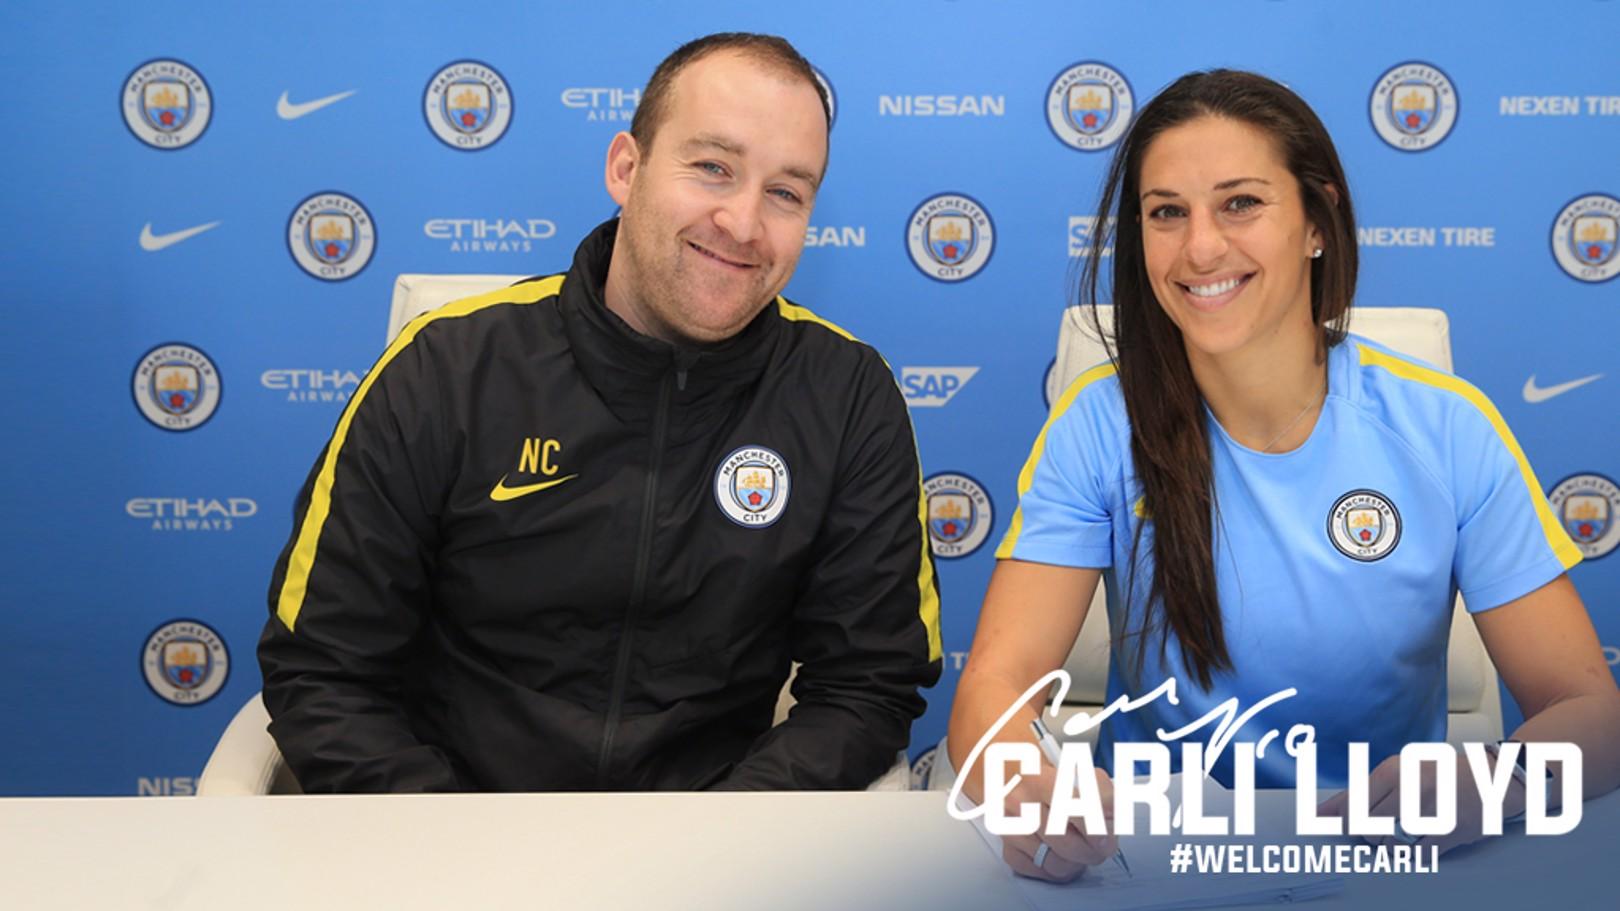 WELCOME CARLI: Carli Lloyd puts pen to paper alongside manager Nick Cushing